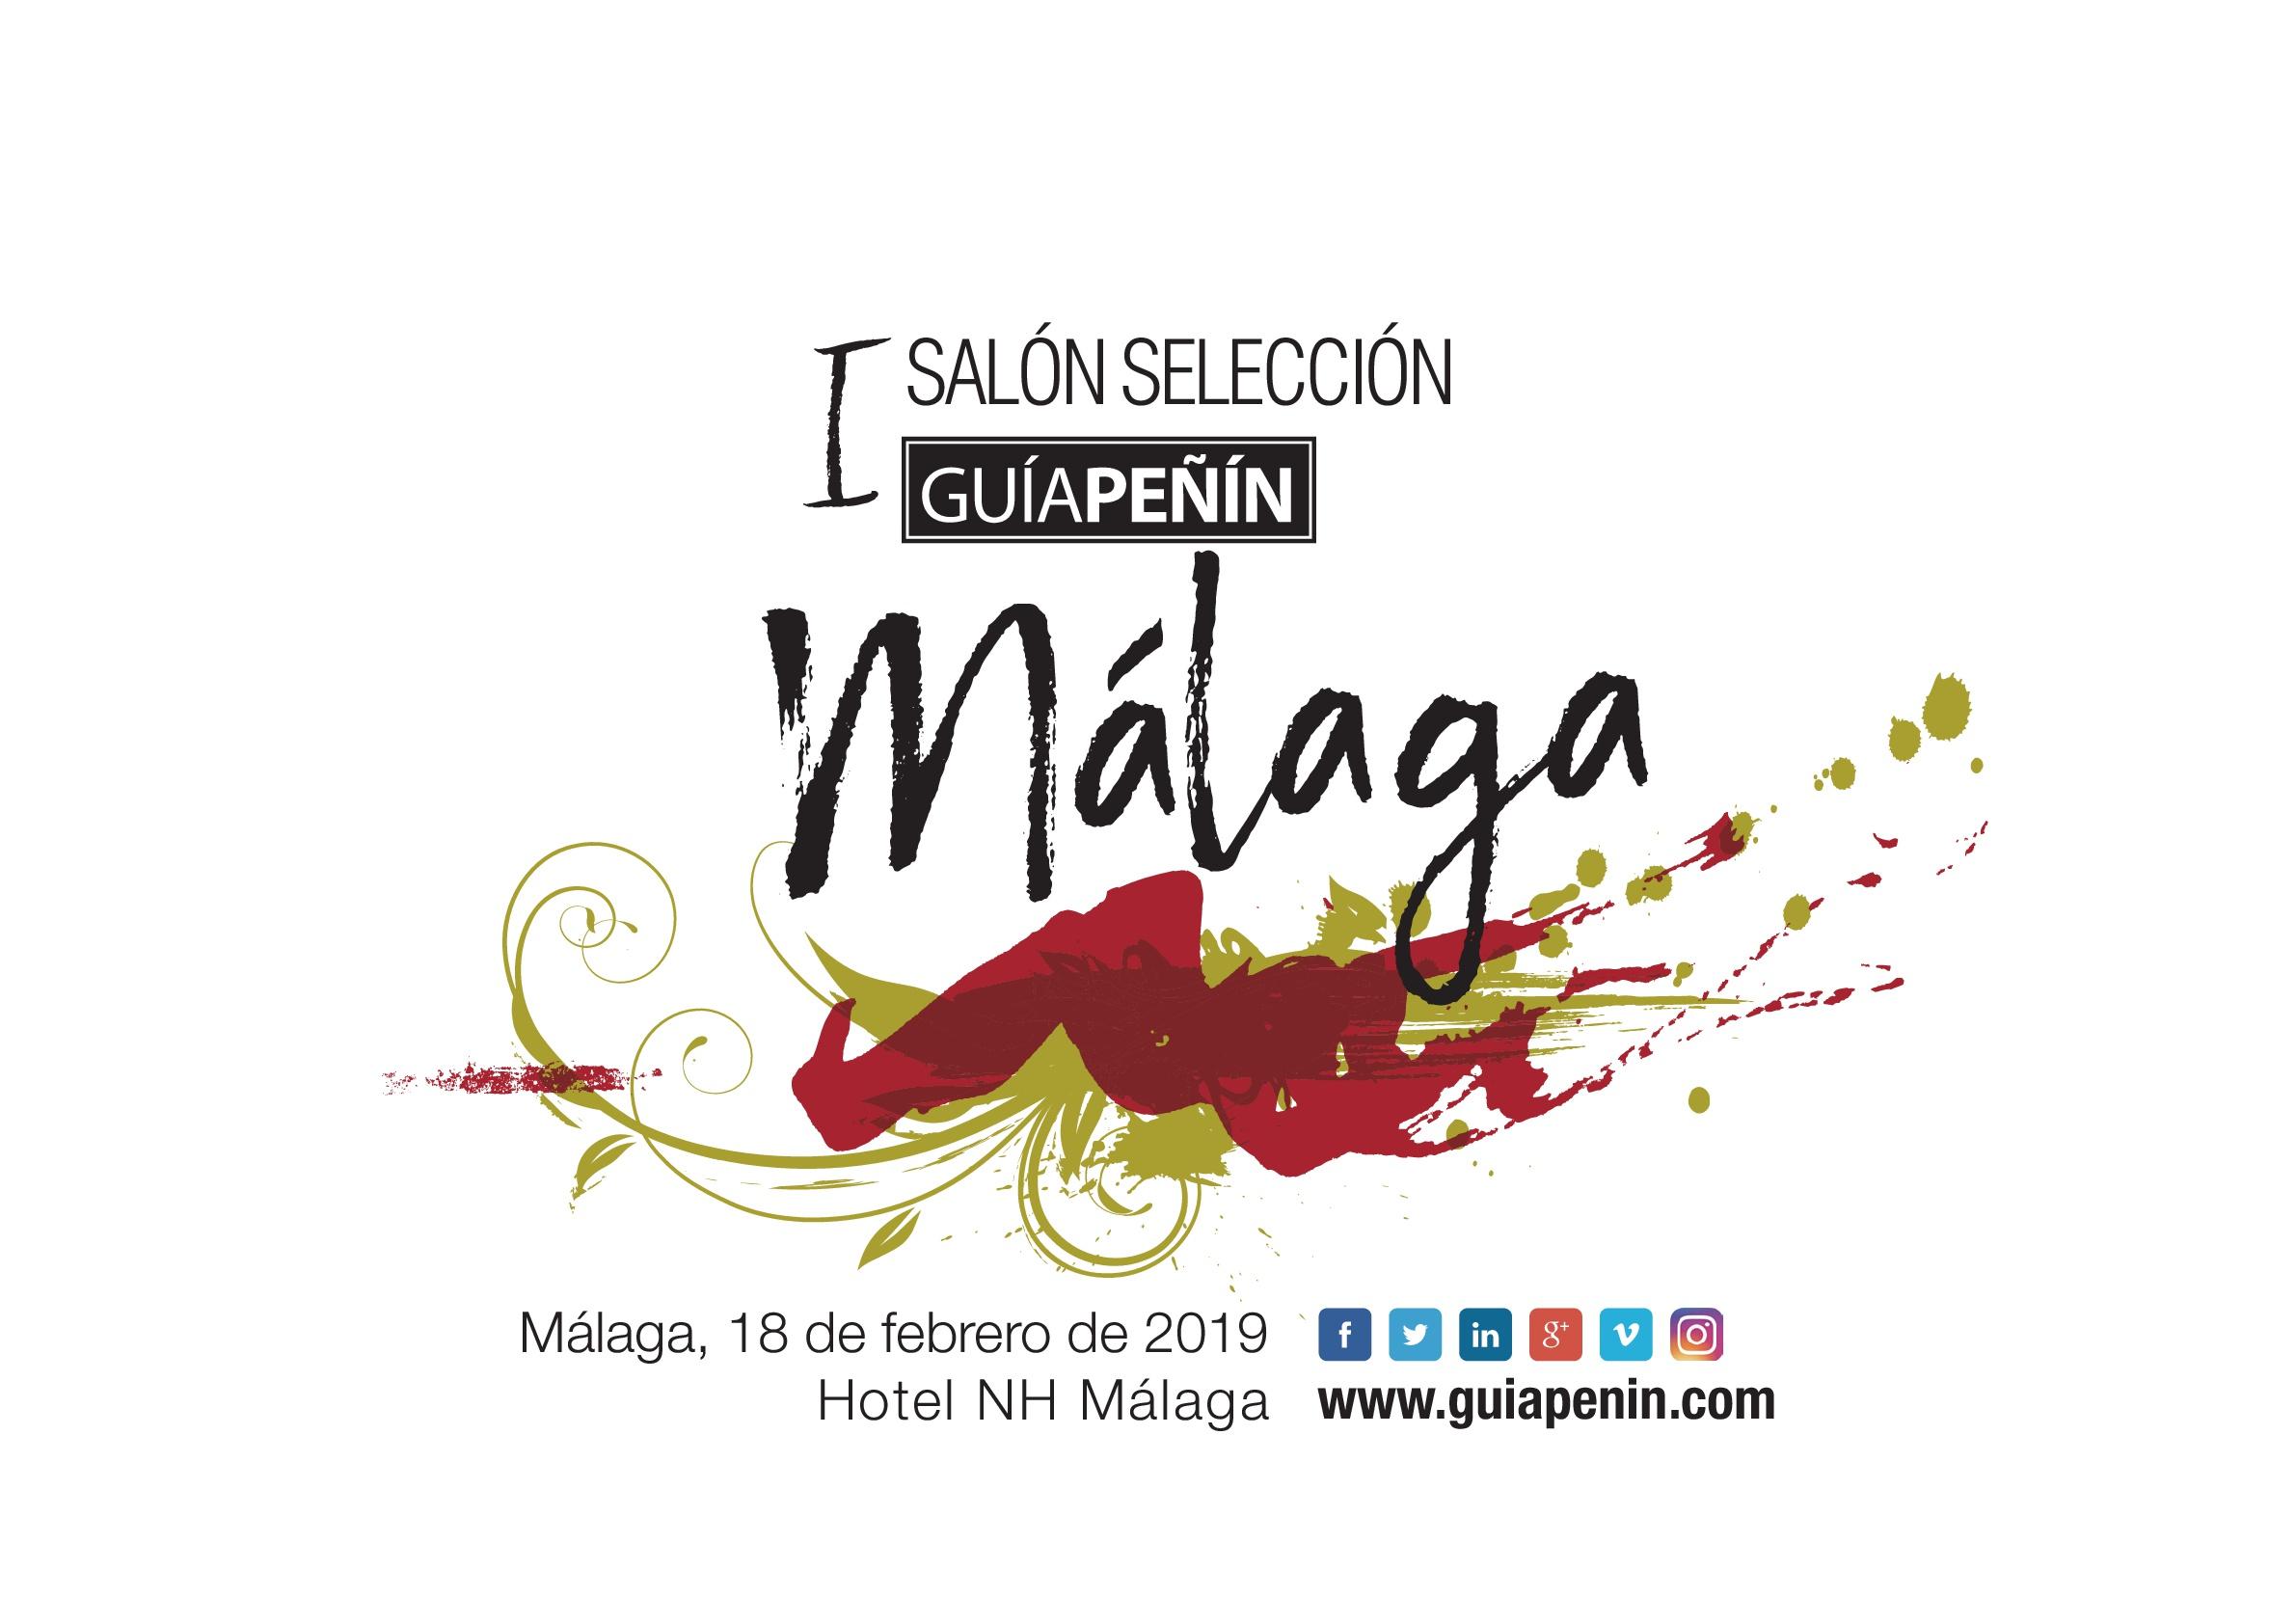 Bodegas Illana Salon Peñin Peñin Málaga